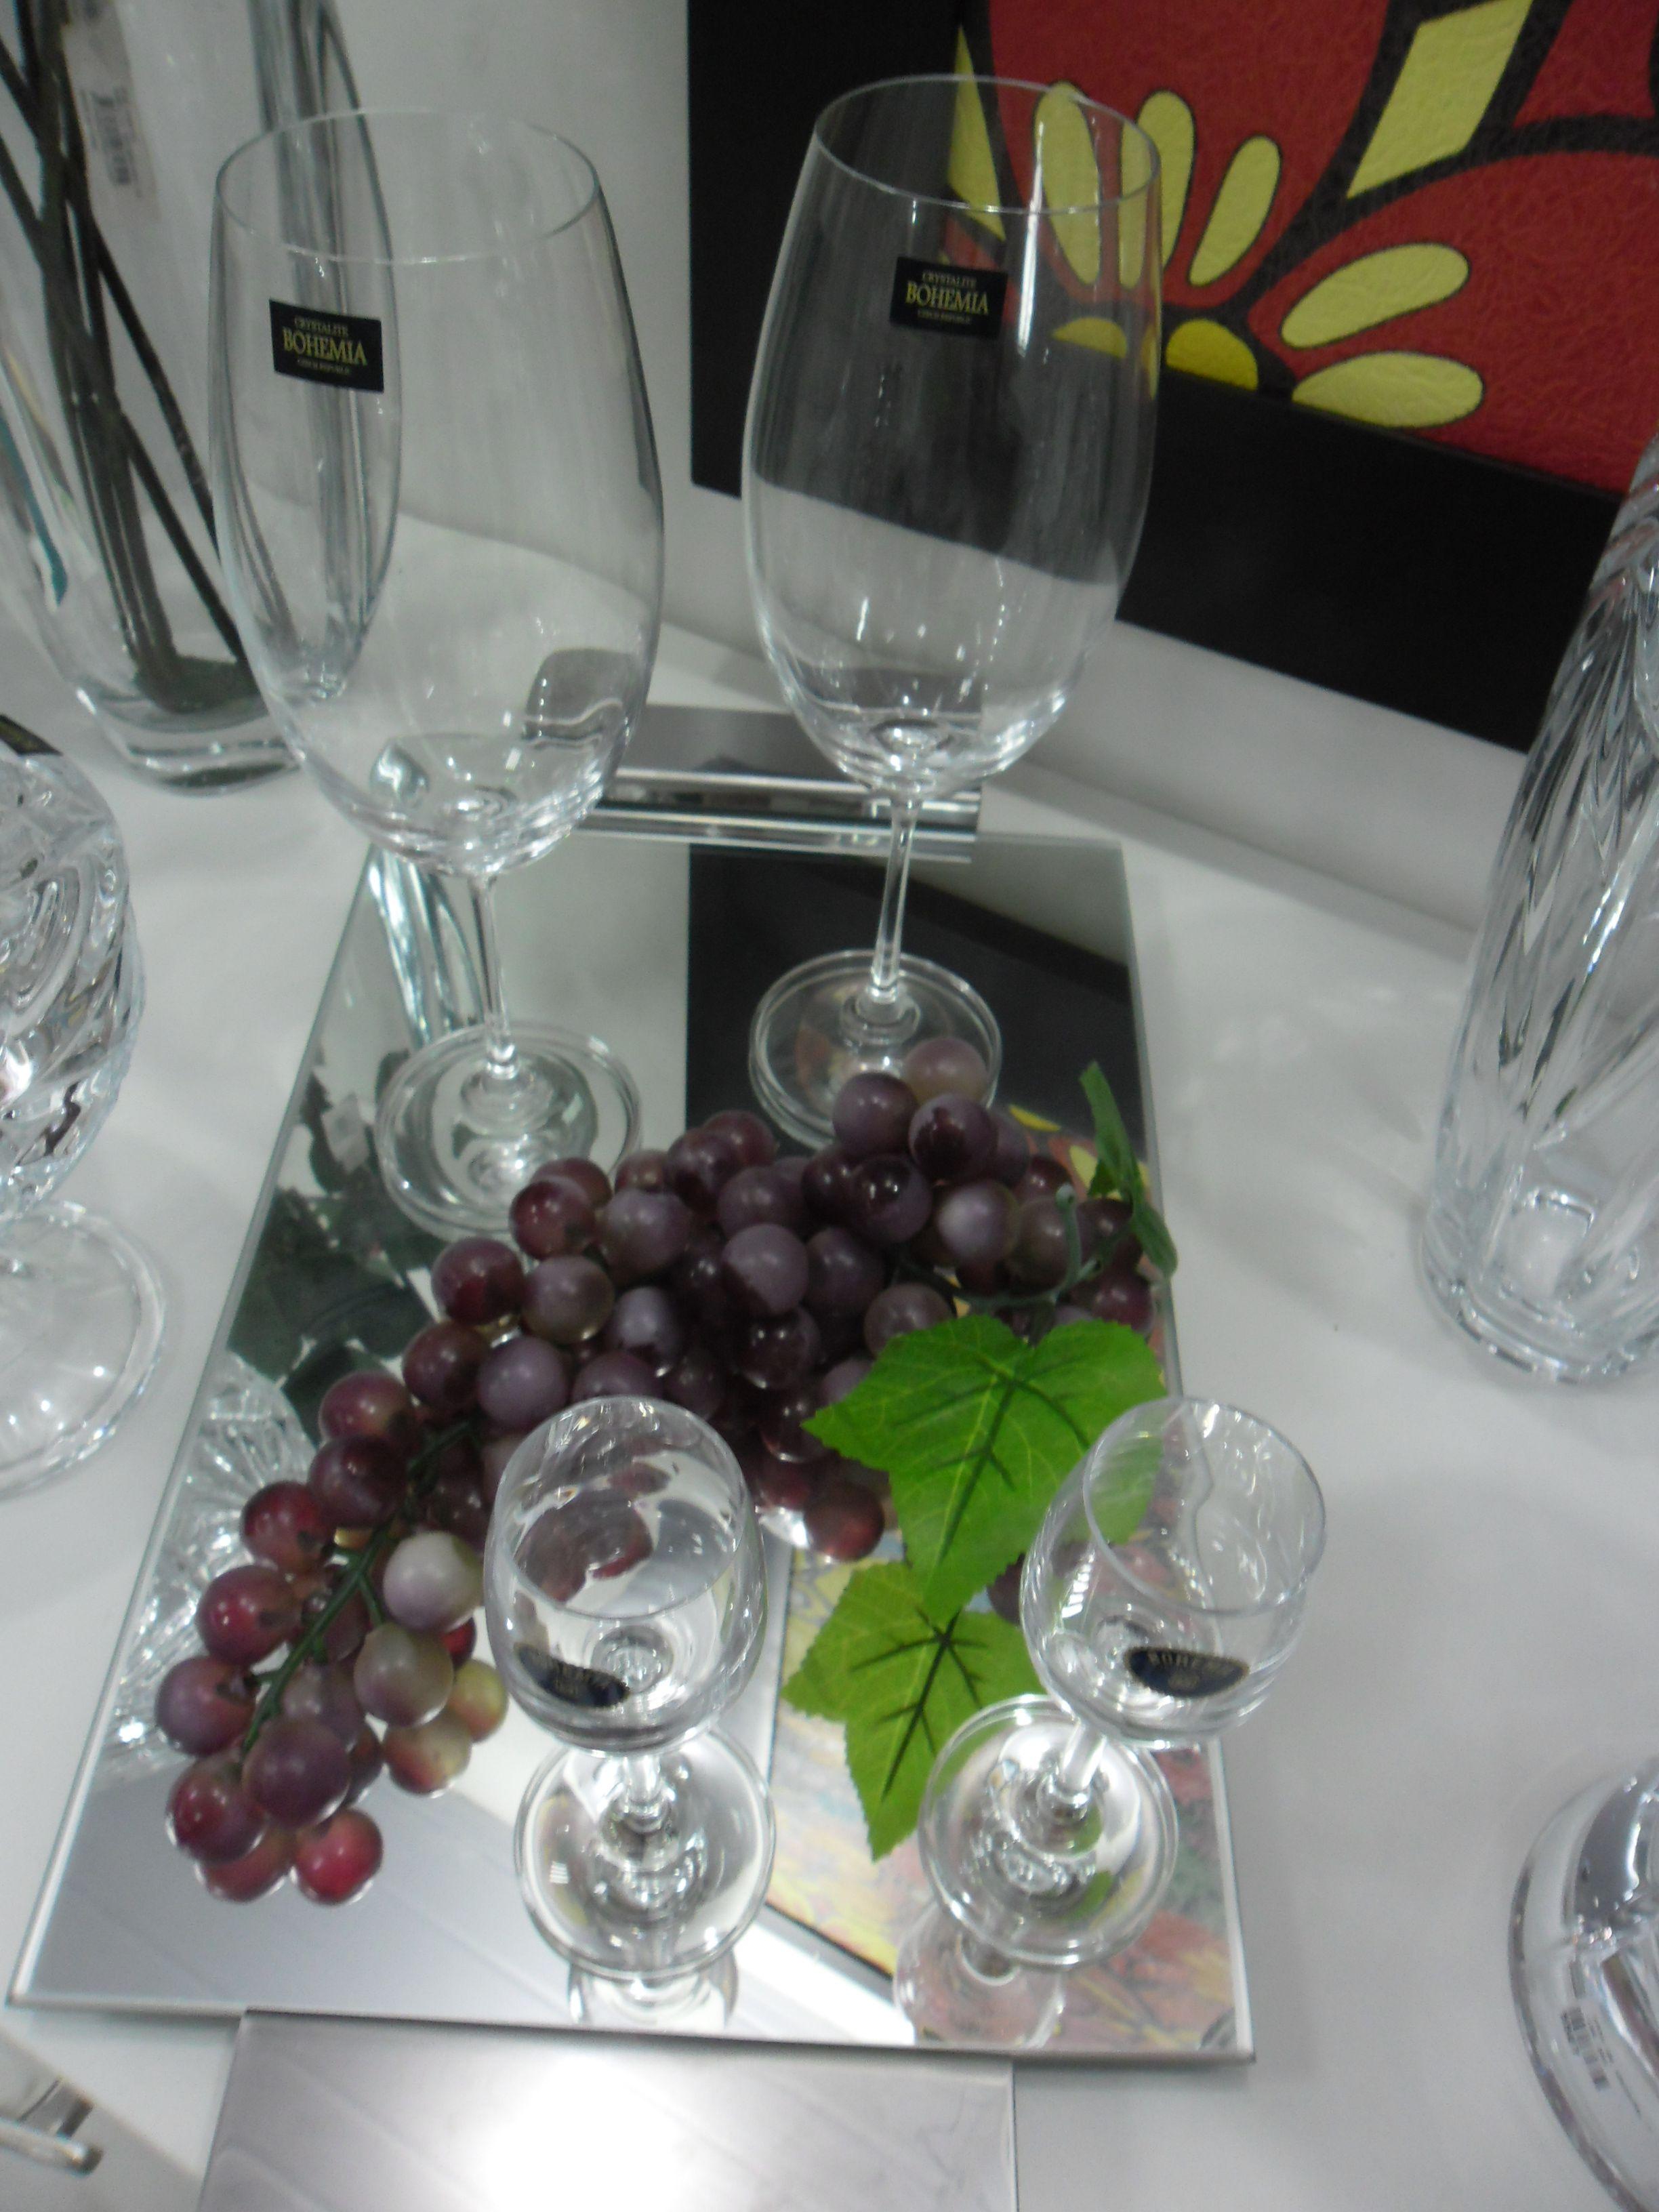 Ta as de cristal bandeja de vidro cacho de uva - Bandejas de cristal ...